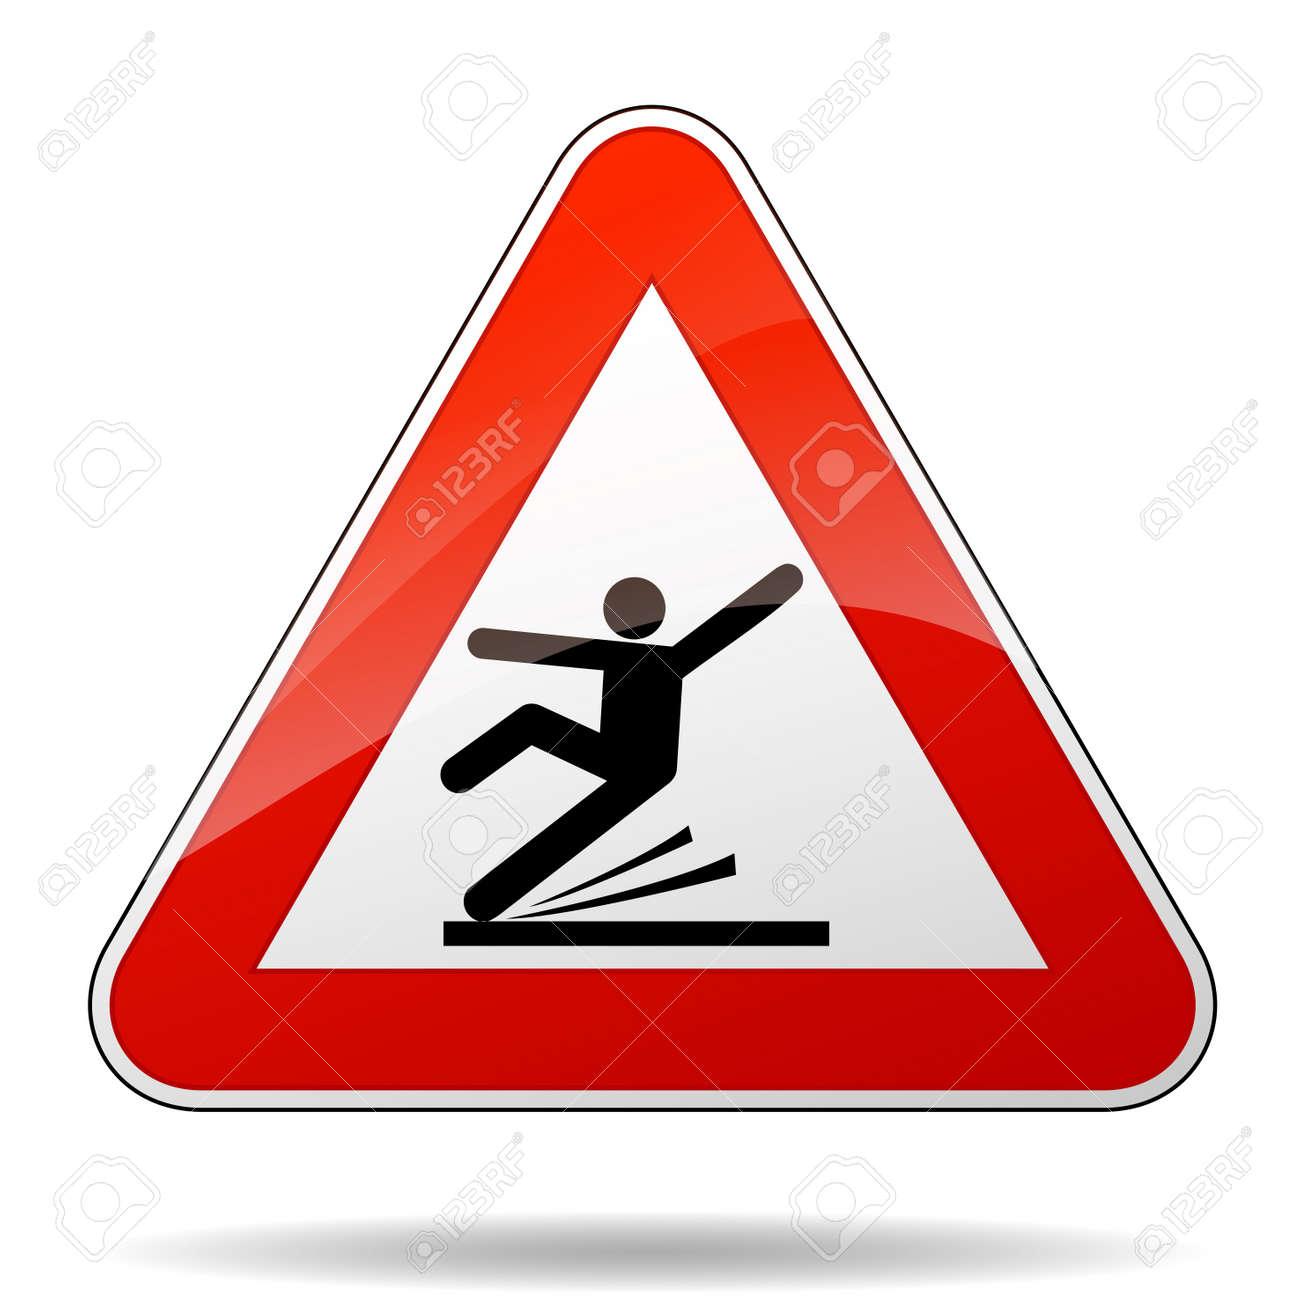 Illustration of warning sign for wet floor - 66547228